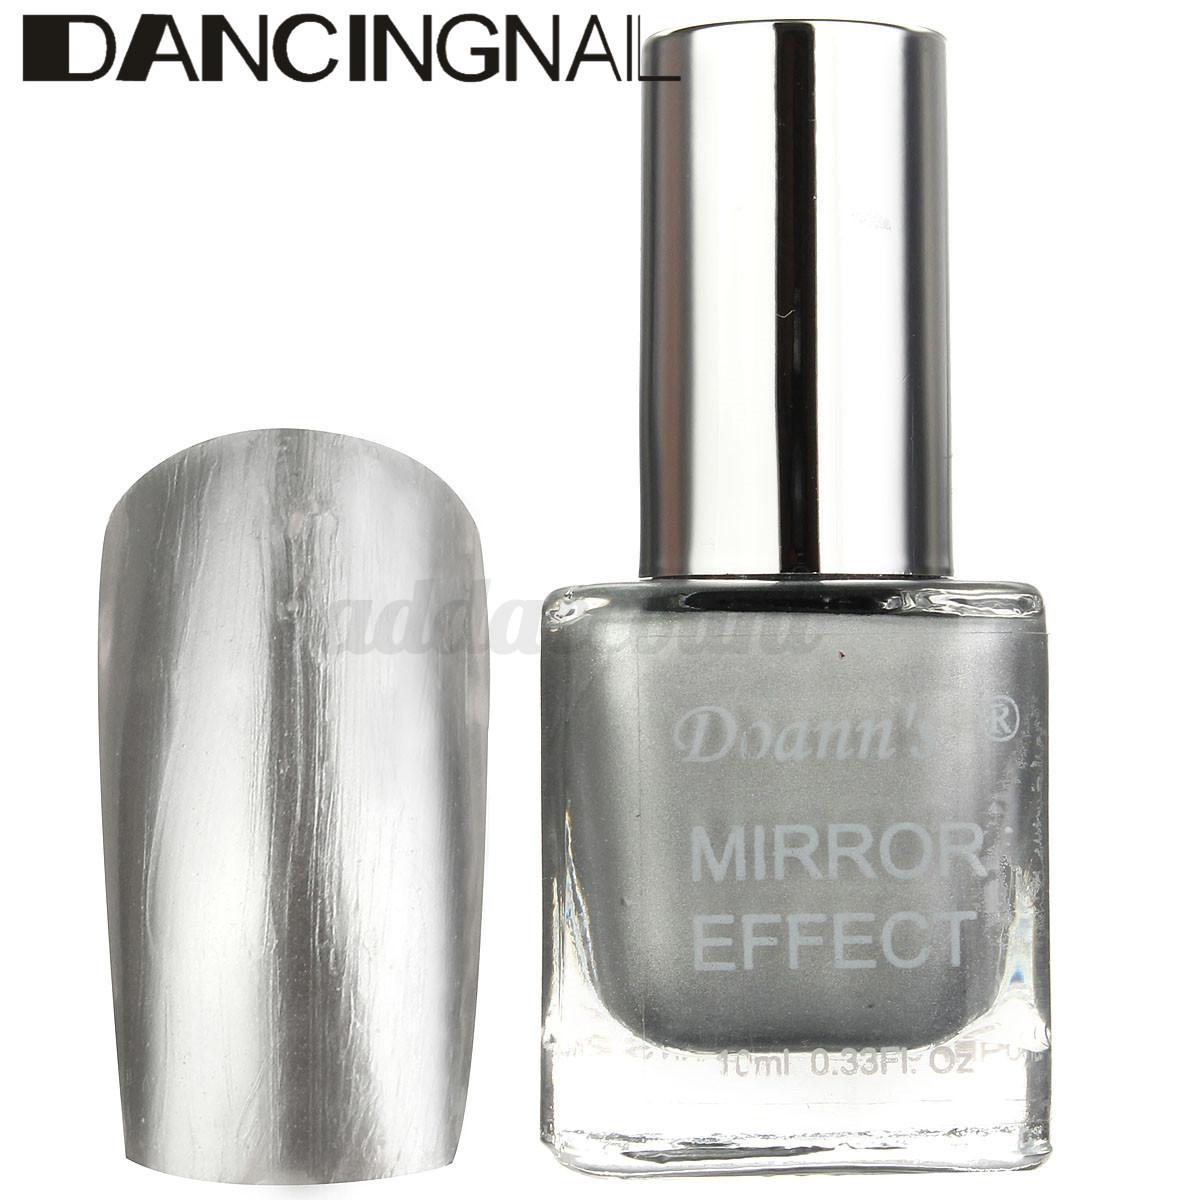 Mirror Effect Gel Nail Polish: 10ML Bling Metallic Mirror Effect Soak Off Nail Art